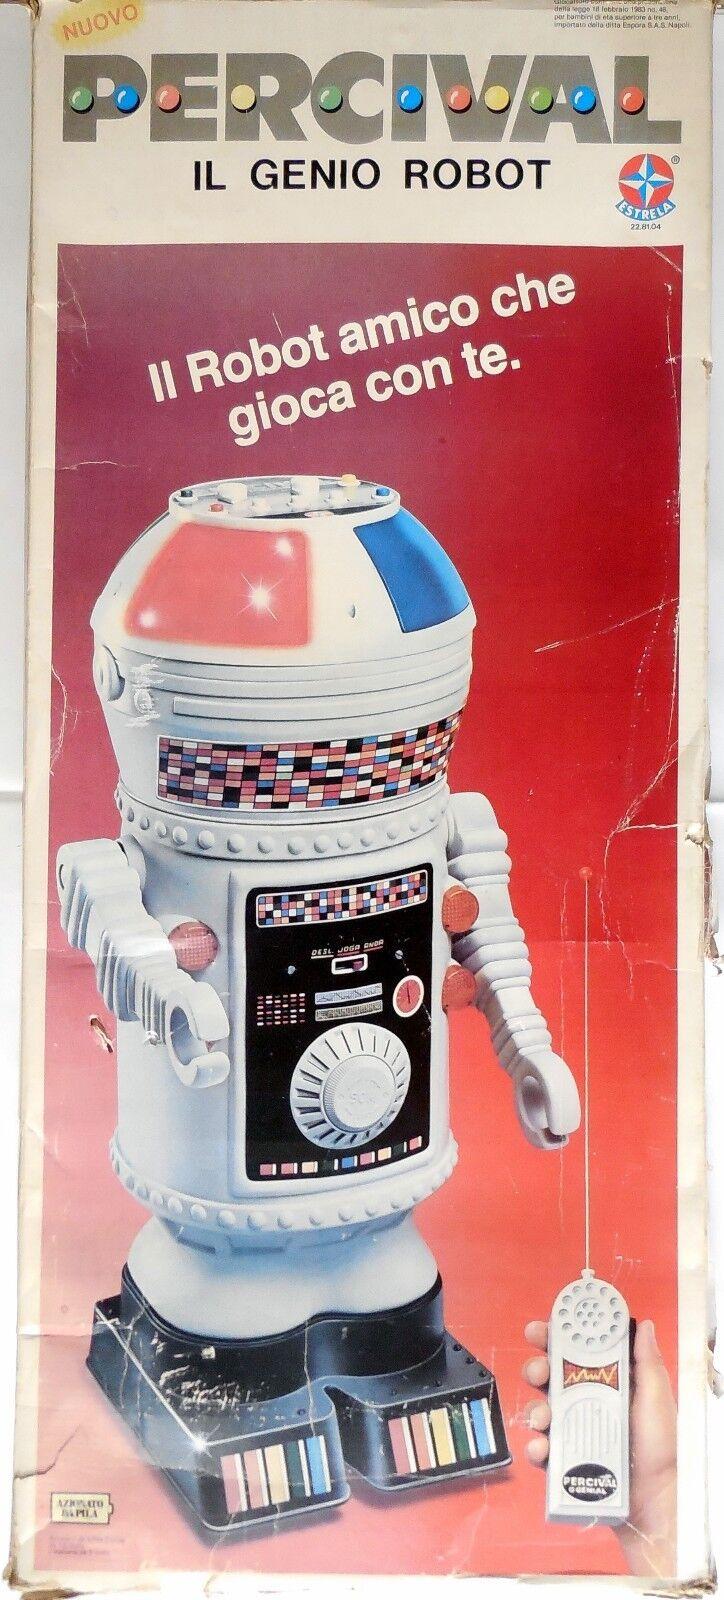 VINTAGE TOY GIOCATTOLO PERCIVAL IL GENIO ROBOT ESTRELA 1983